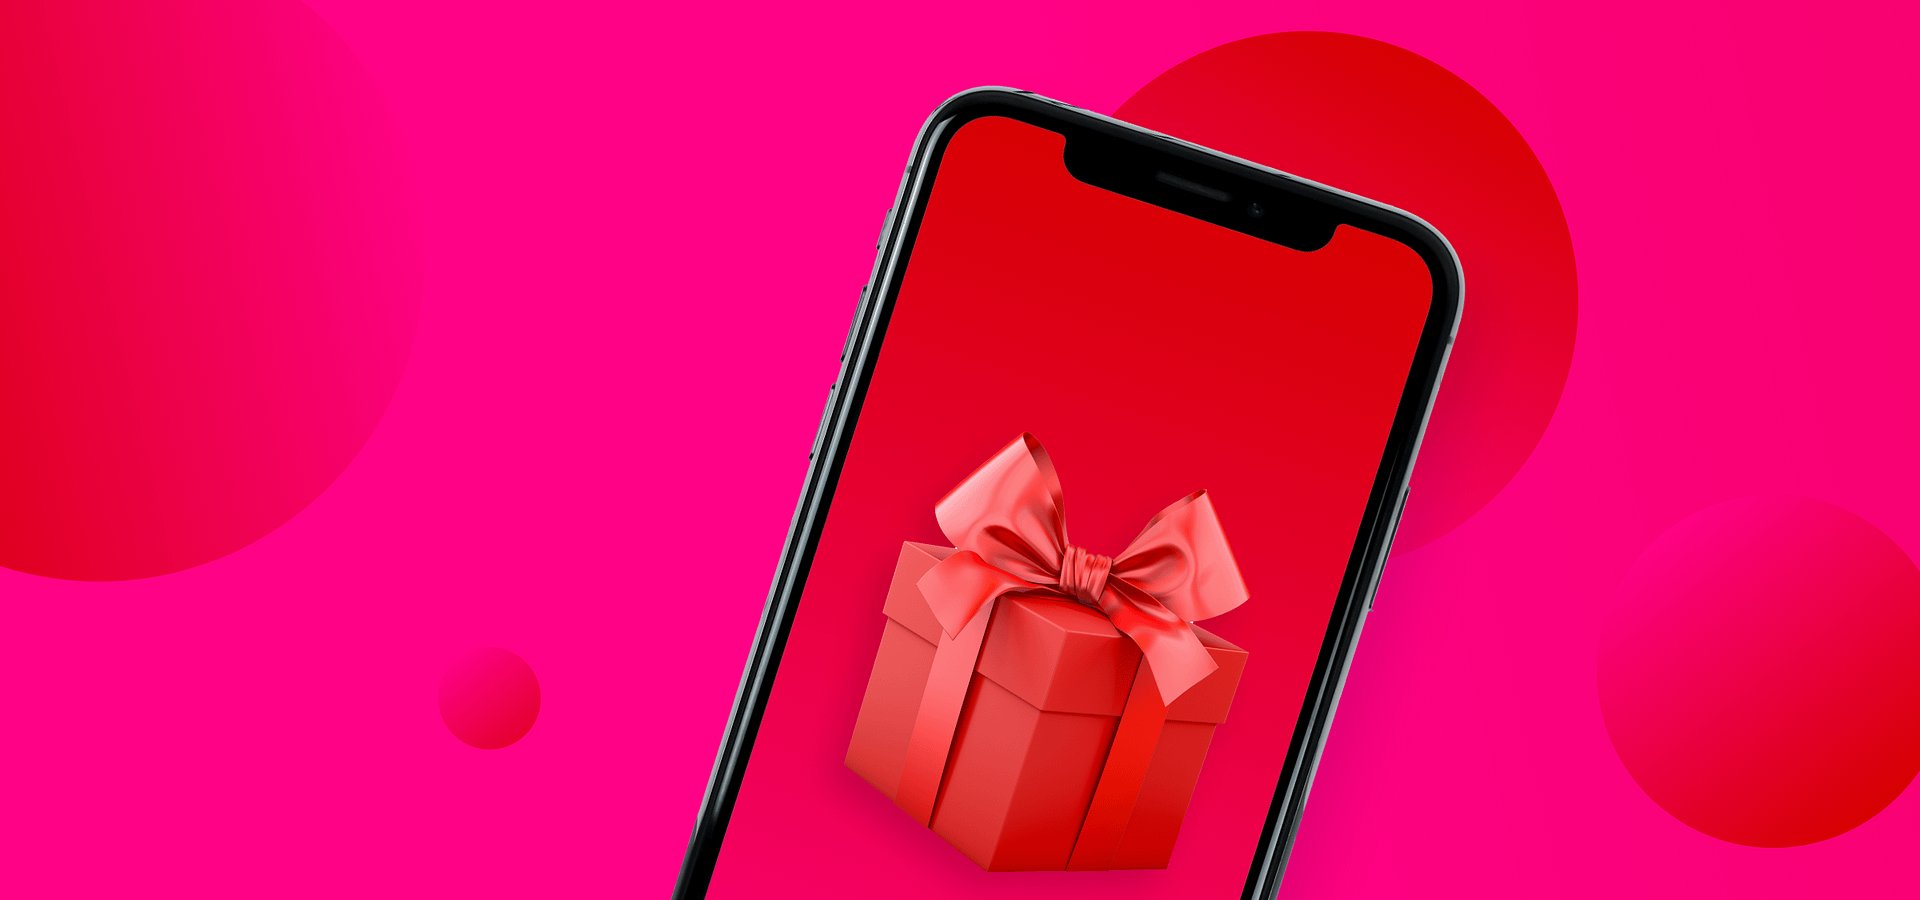 The holidays go digital